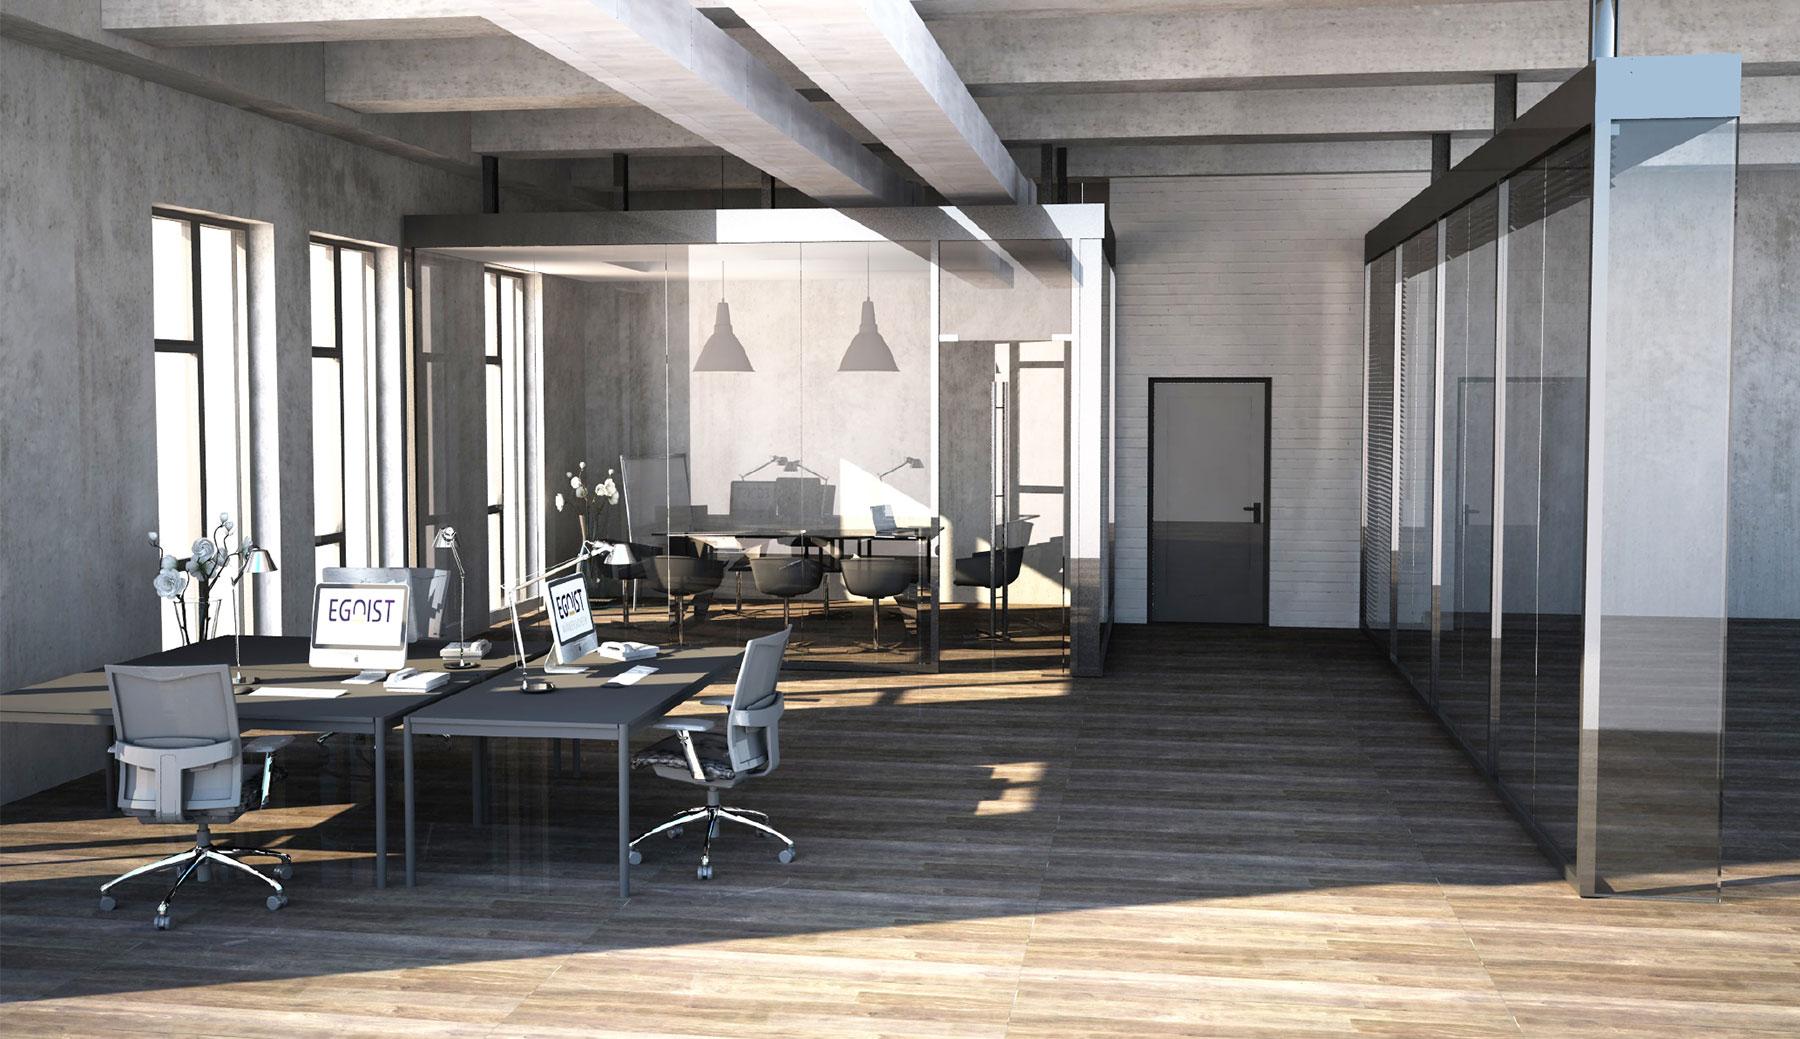 Referenz EGO_IST Büro Innenarchitektur SDW DESIGN